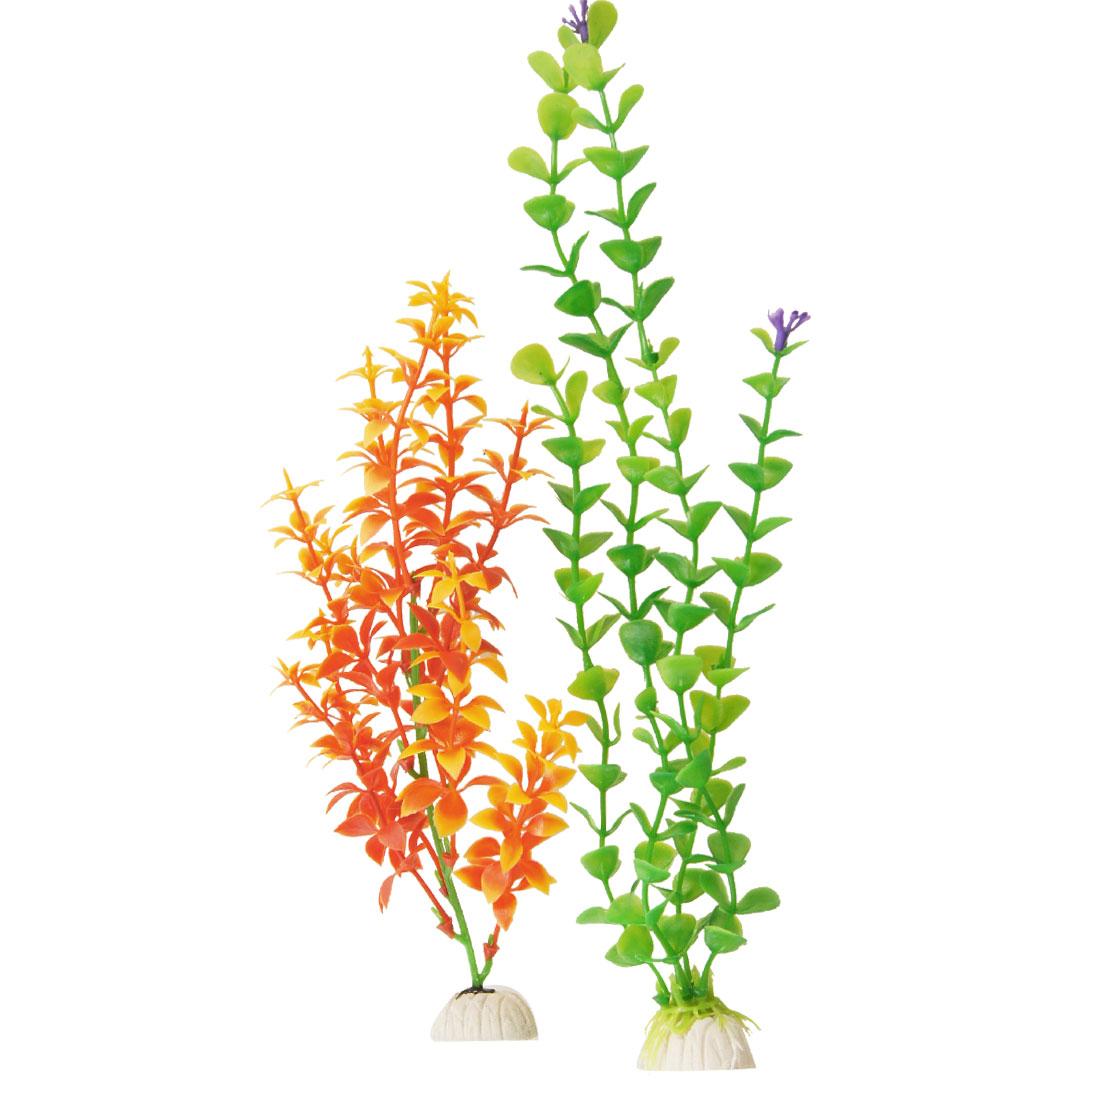 2 Pcs Green Orange Aritificial Plastic Aquascaping Plant Grass for Fish Tank Aquarium